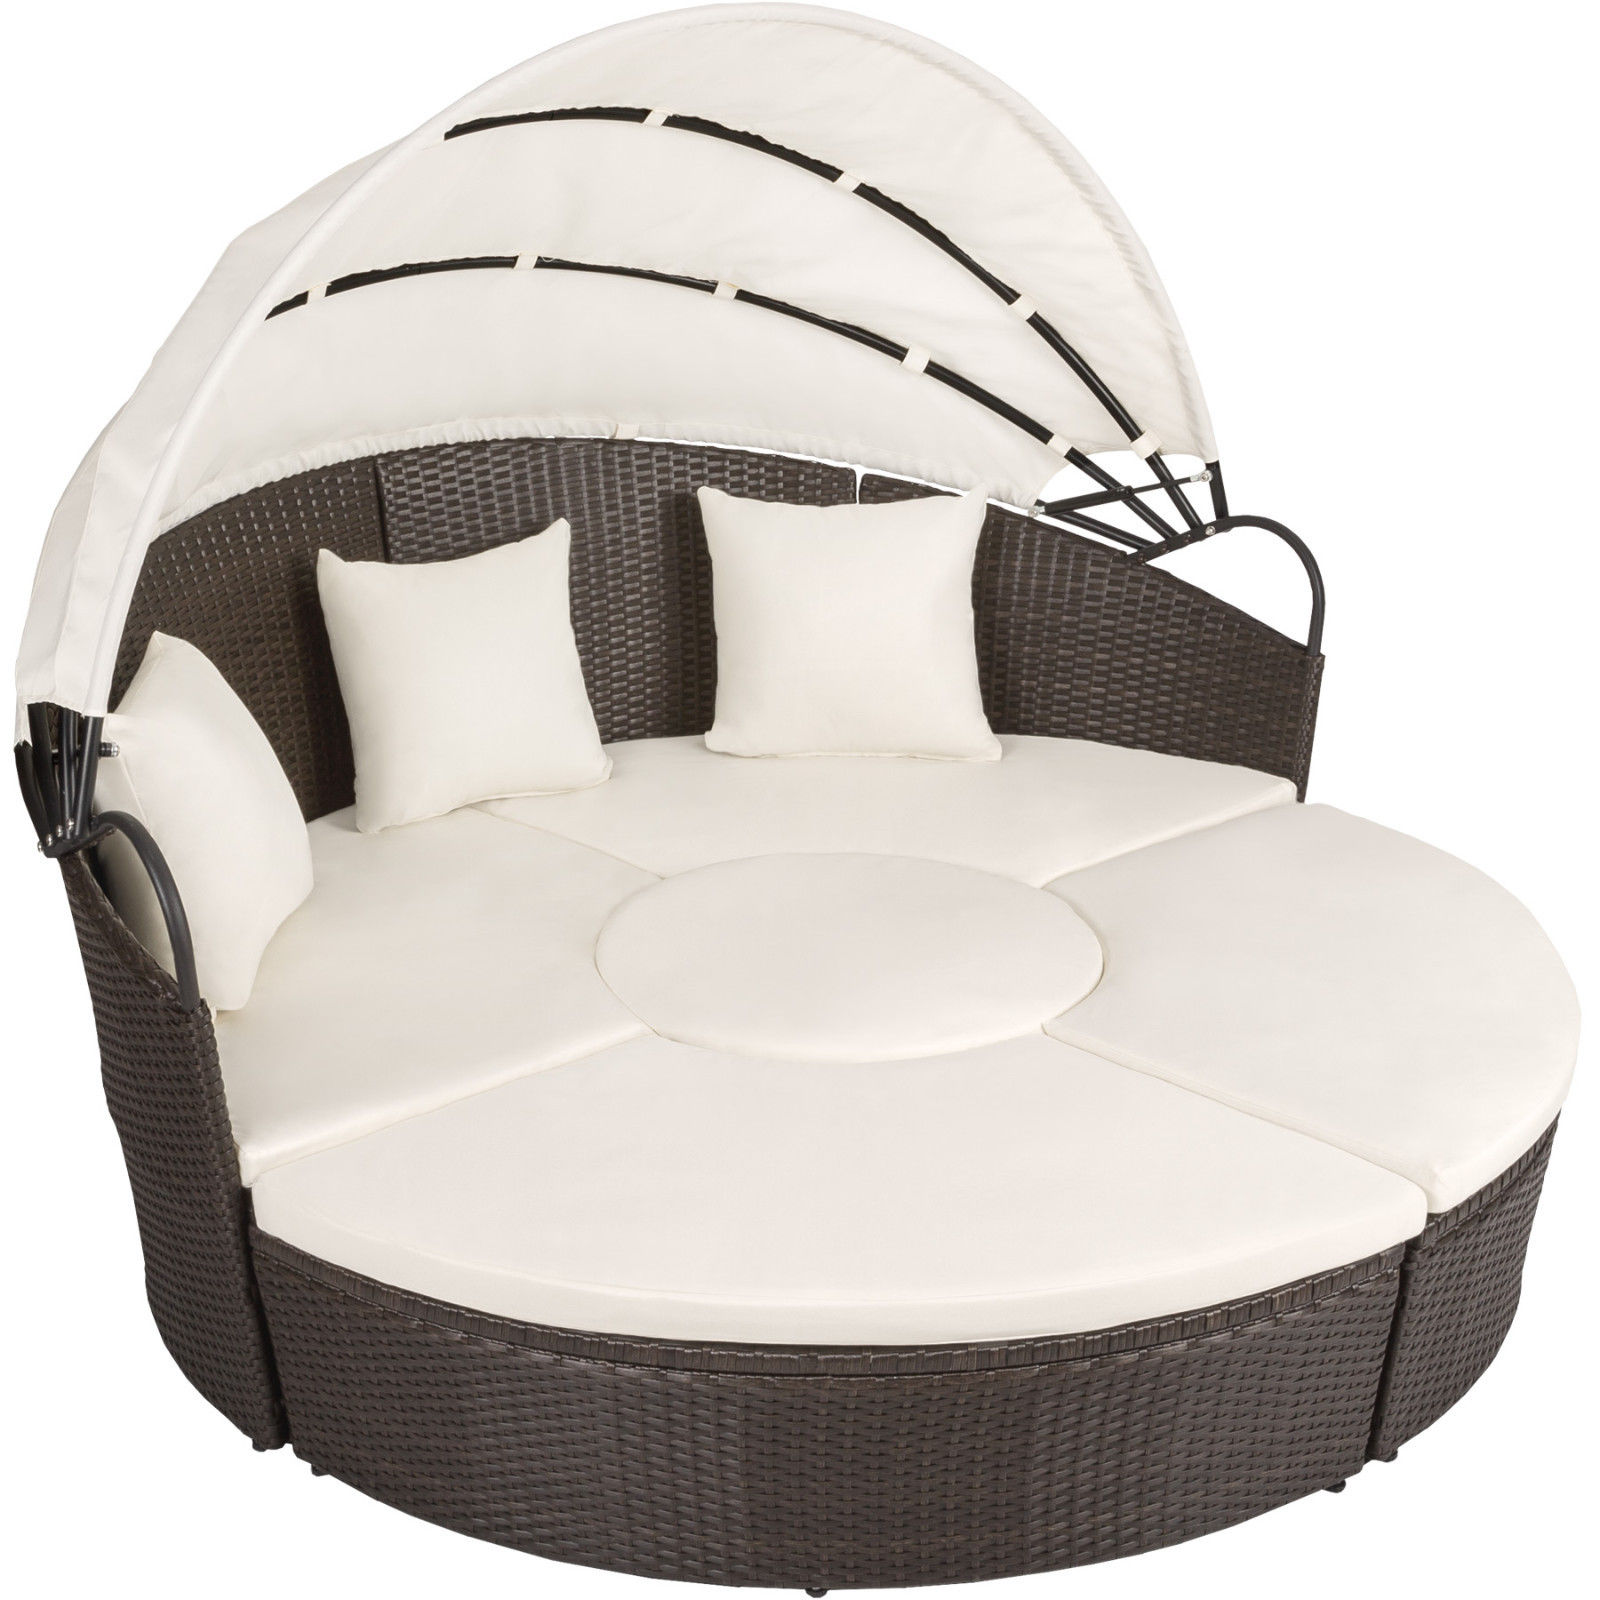 Alu rattan day mattress garden furnishings outside lounger sofa photo voltaic roof desk brown an